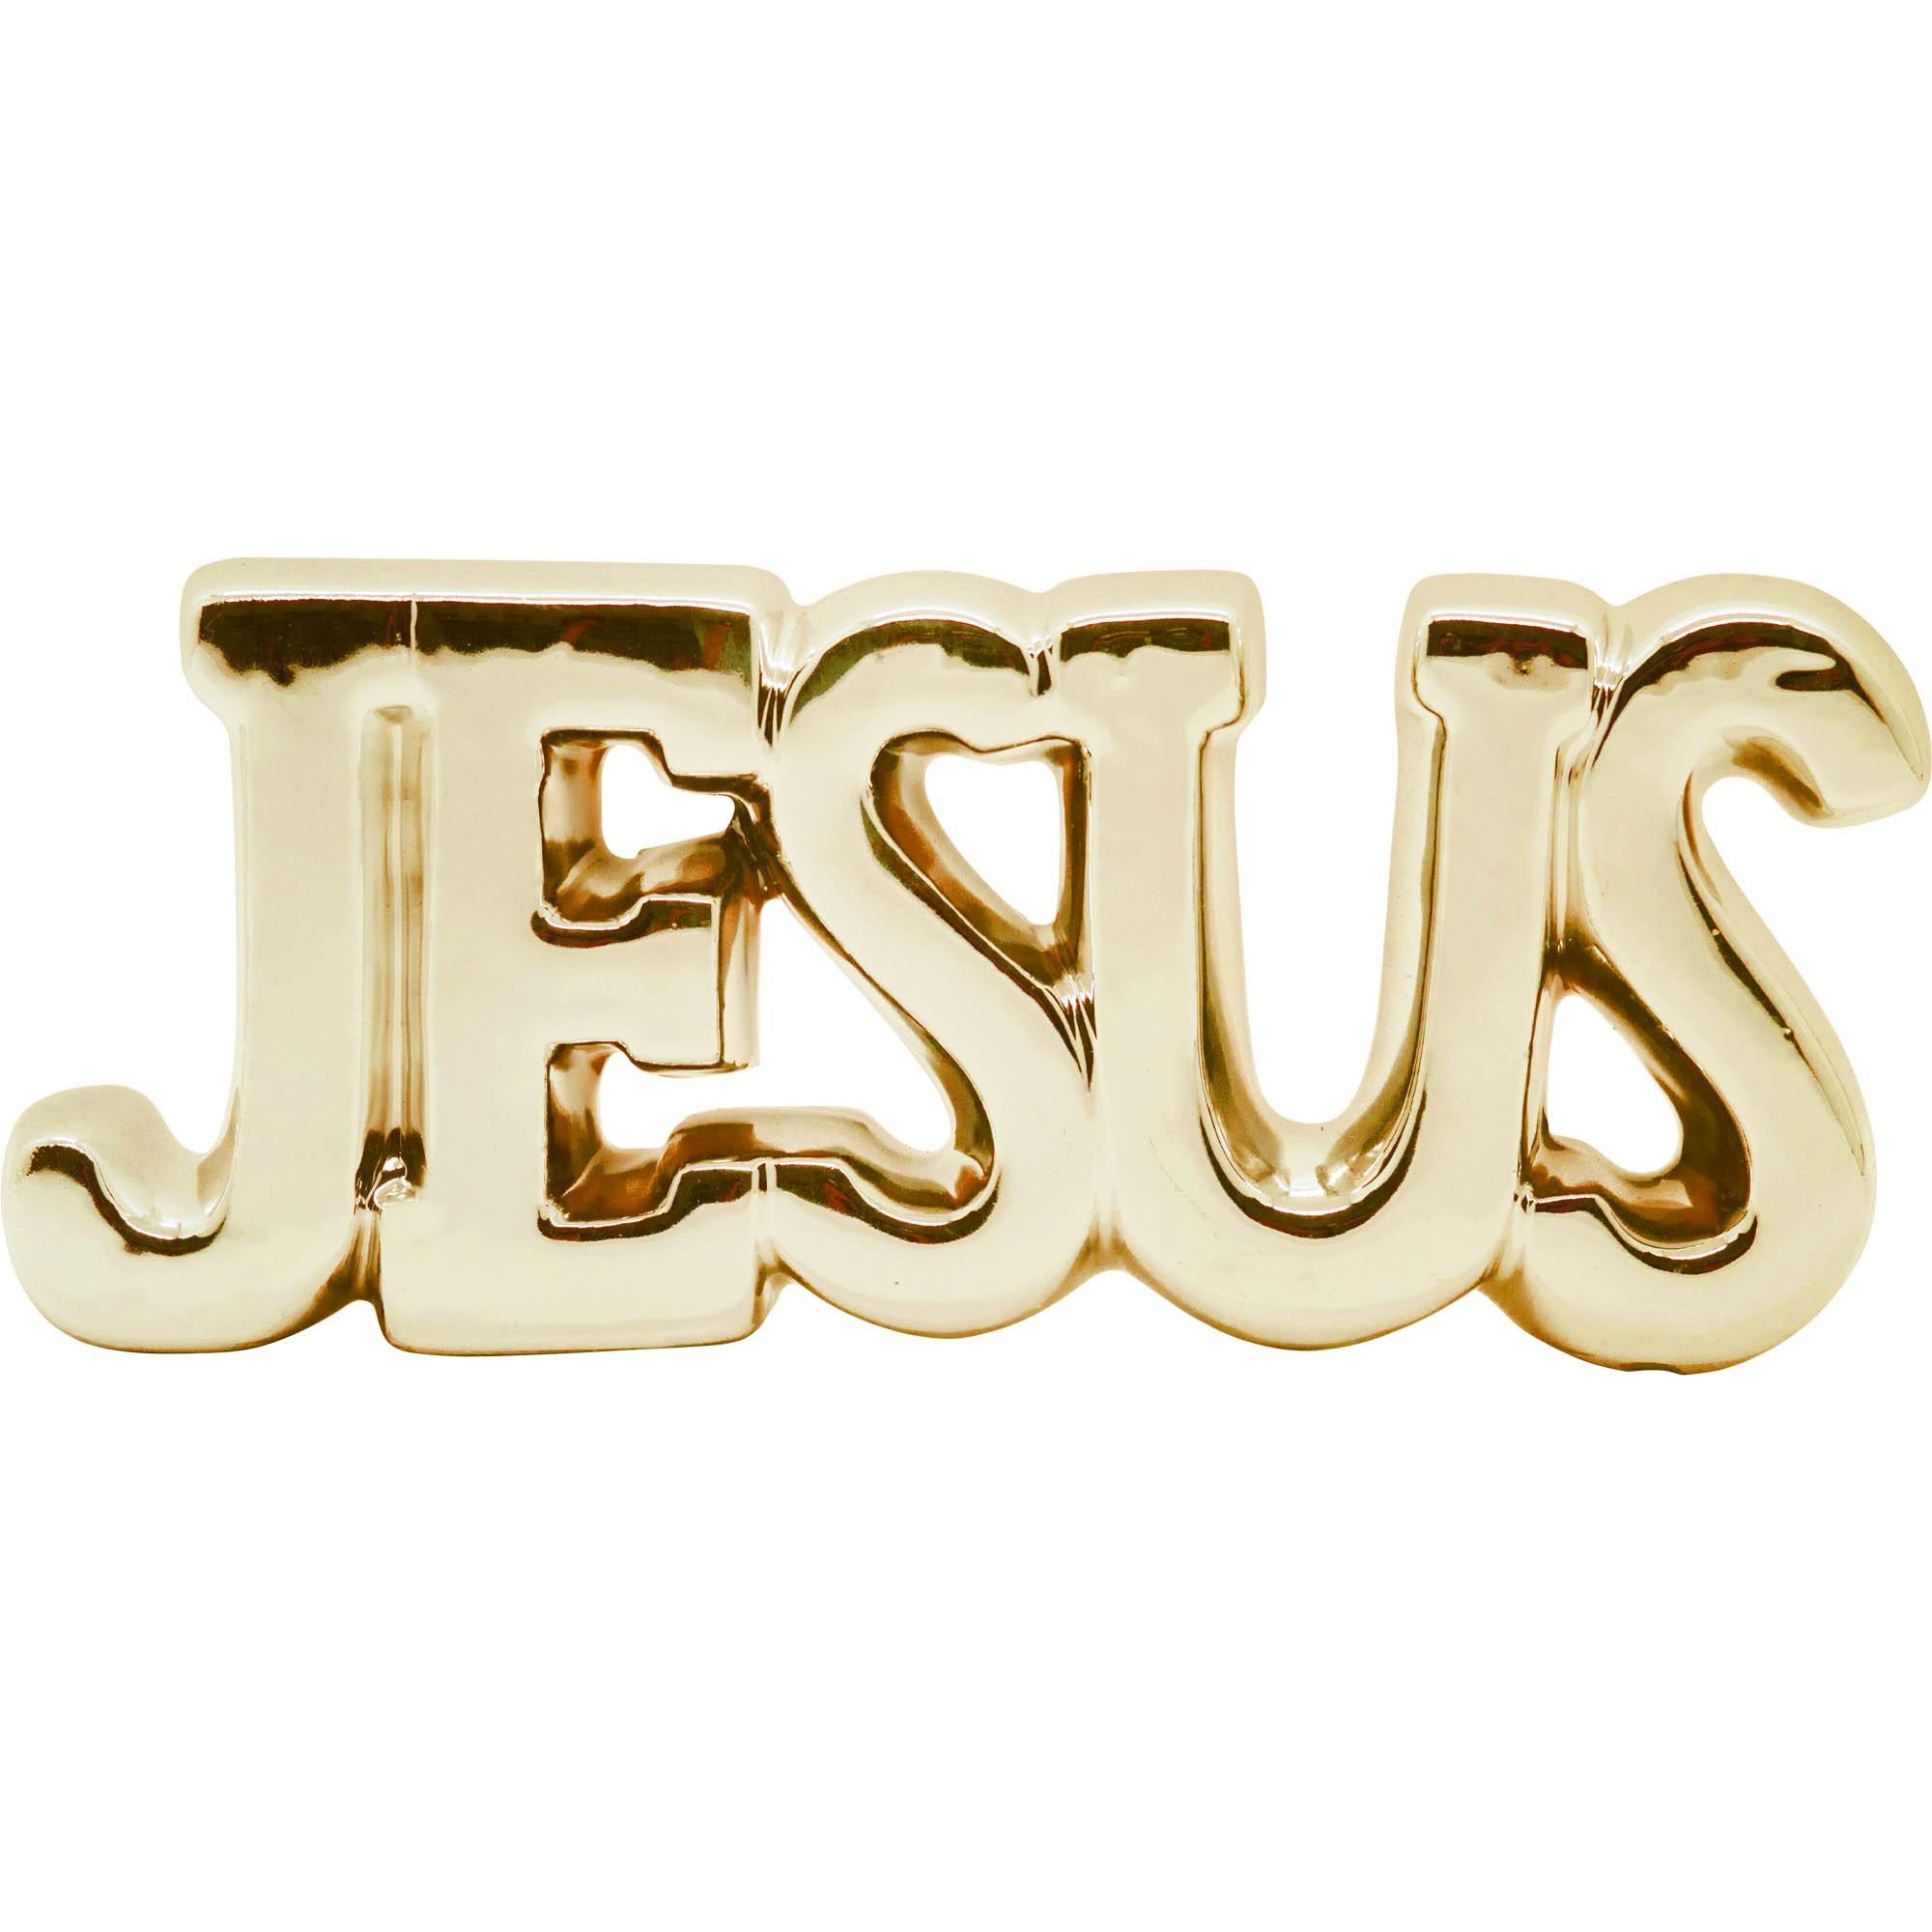 ENFEITE DE MESA CERÂMICA JESUS SHINING - YIN'S HOME DOURADO